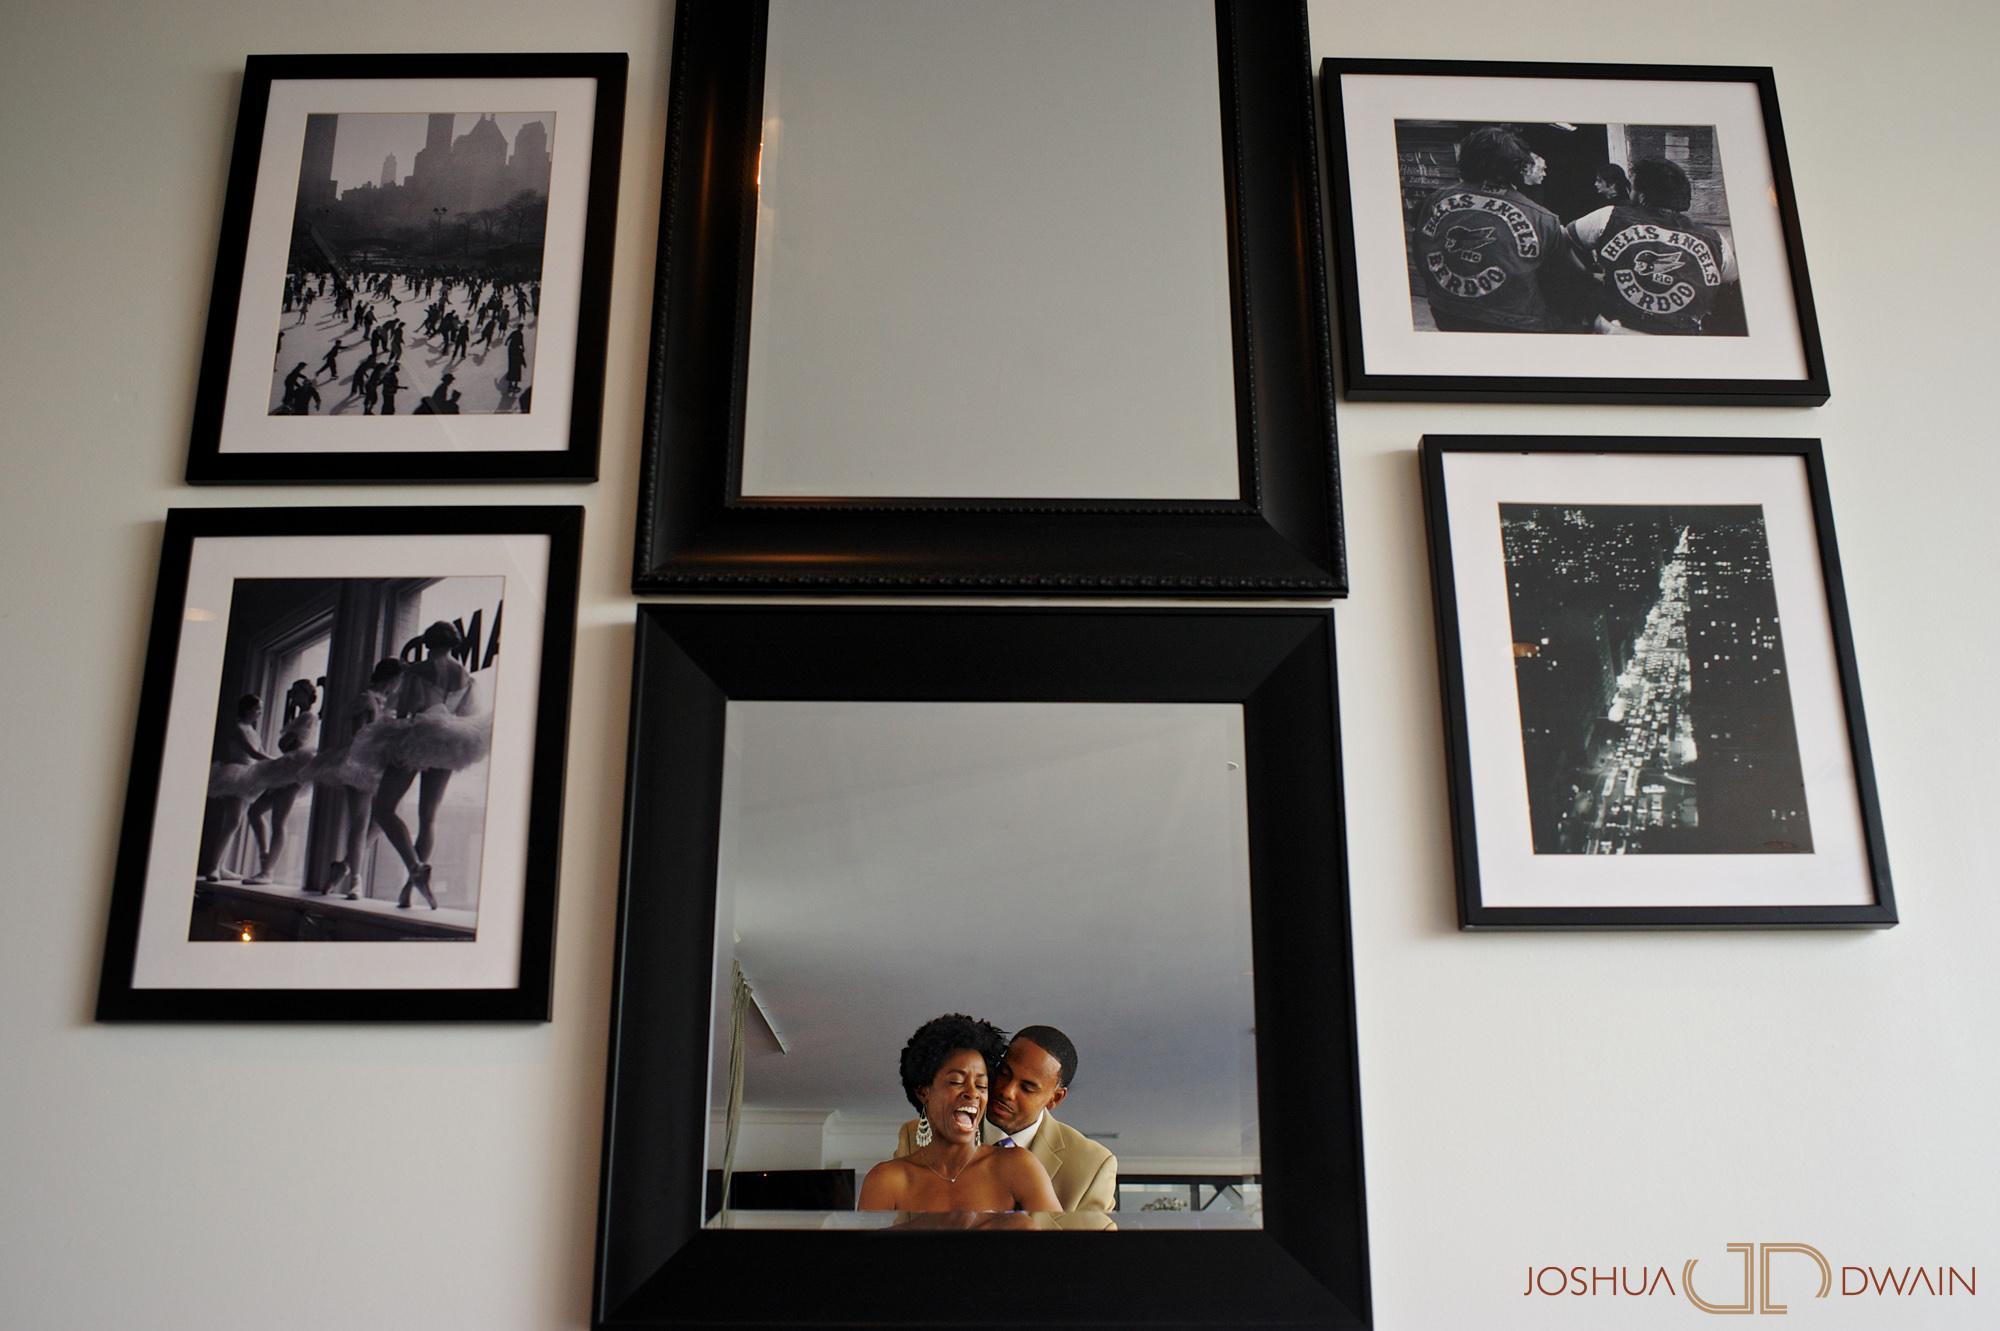 essence-luke-001-radisson-hotel-new-rochelle-ny-engagement-photographer-joshua-dwain-2013-06-26_EL_008